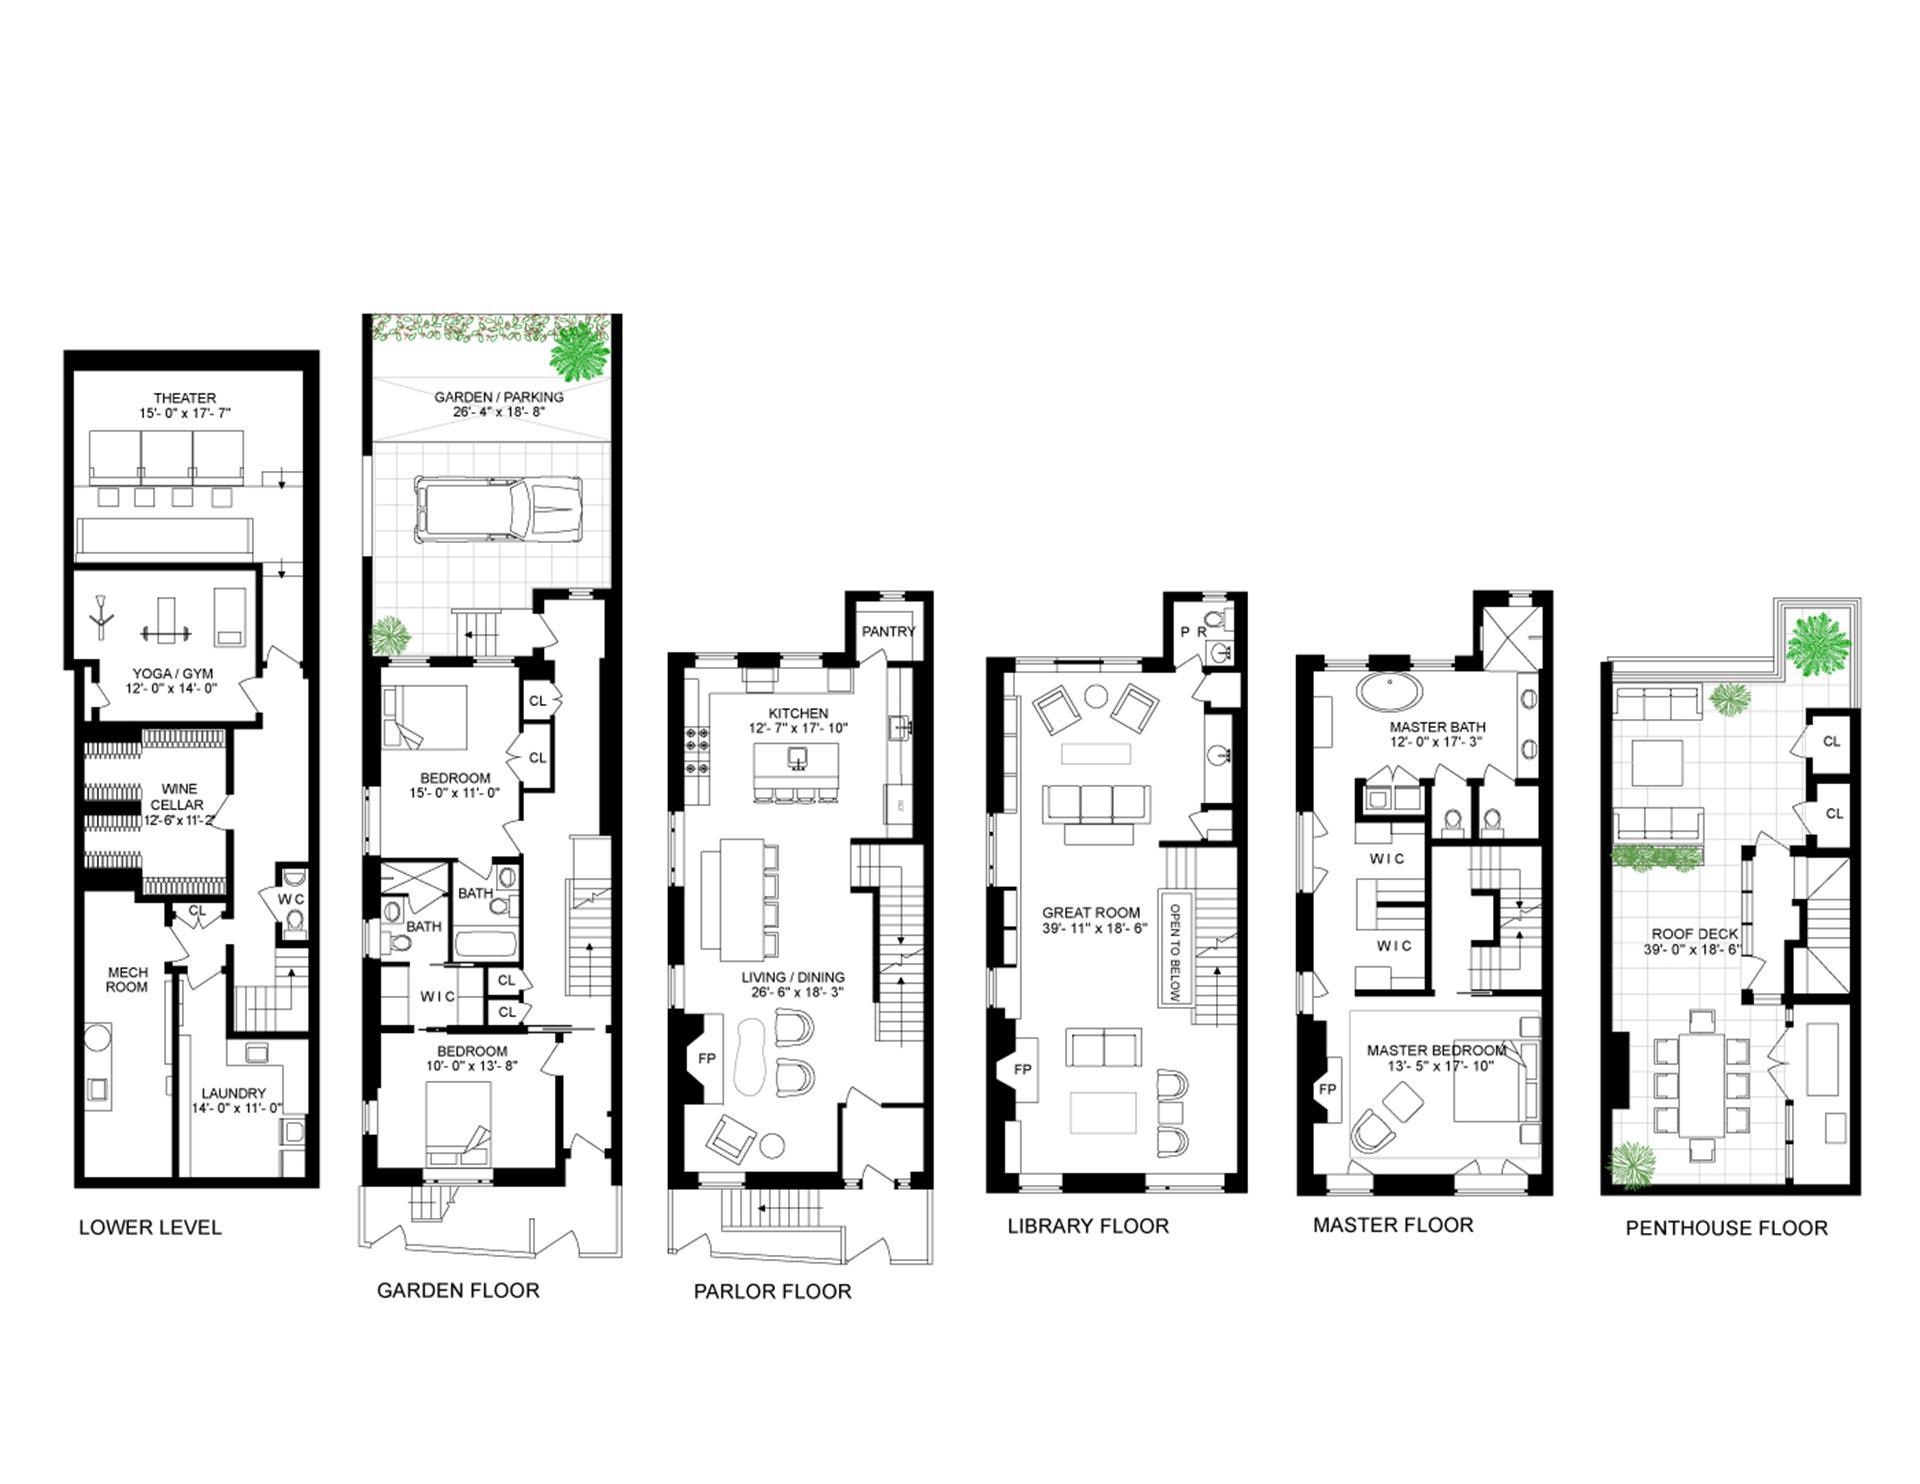 Floor plan of 18 Grove St - West Village - Meatpacking District, New York